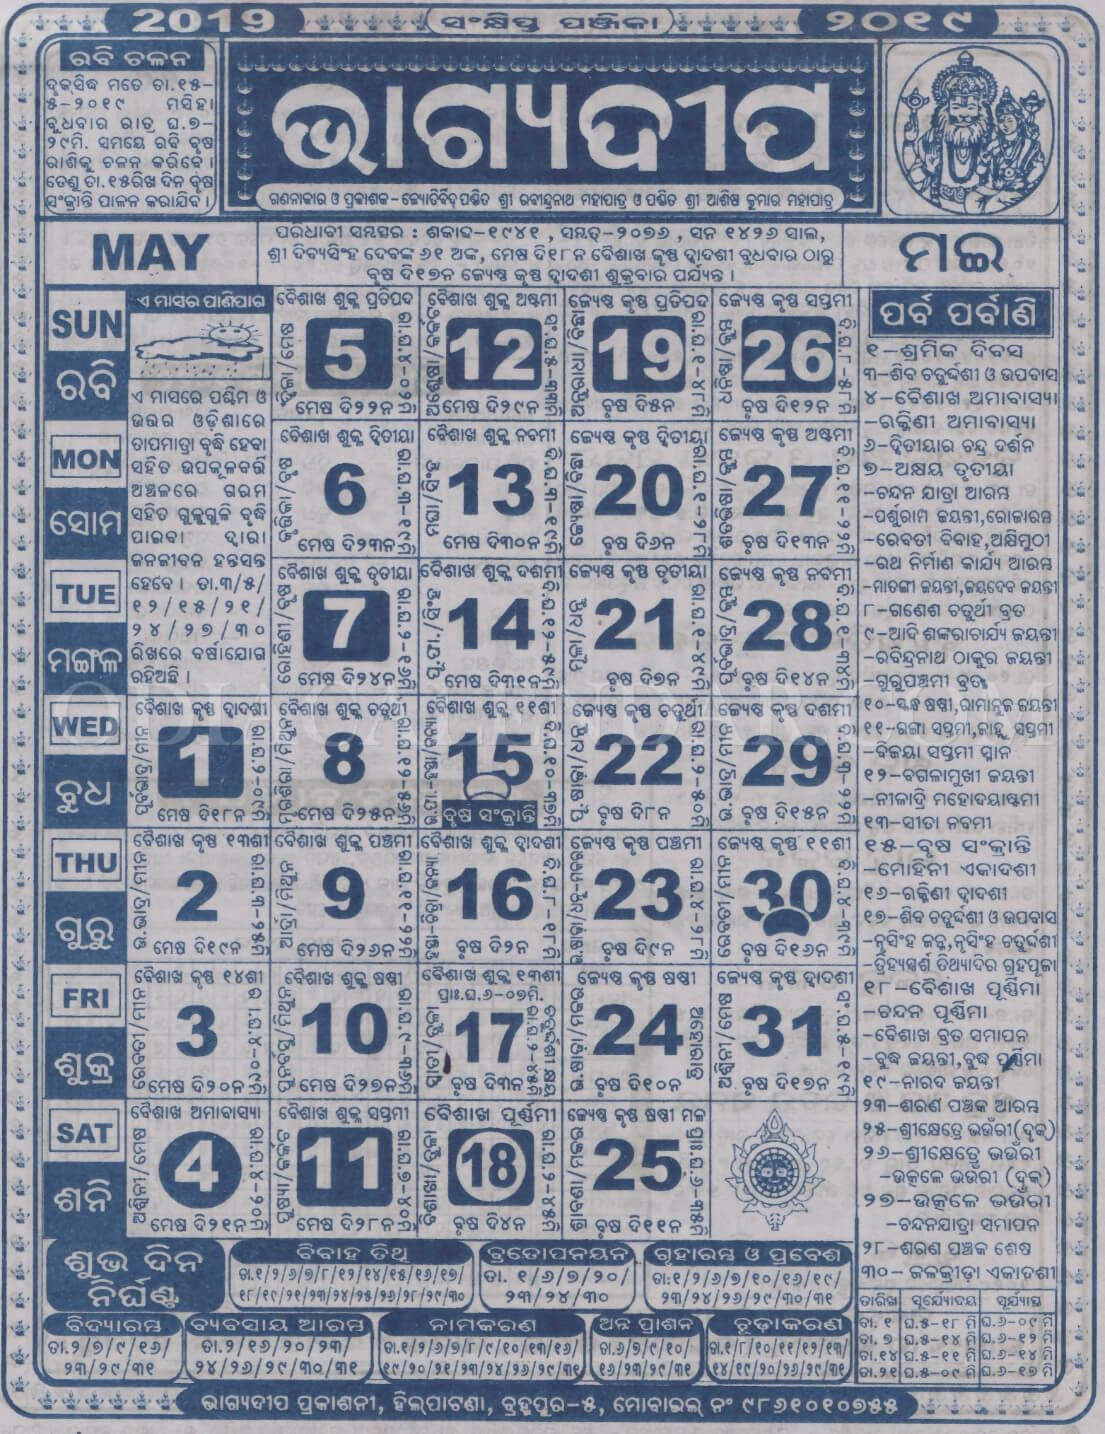 Bhagyadeep Calendar May 2019 | Calendar, Calendar App throughout Bhagyadipa Odia Calendar 2020